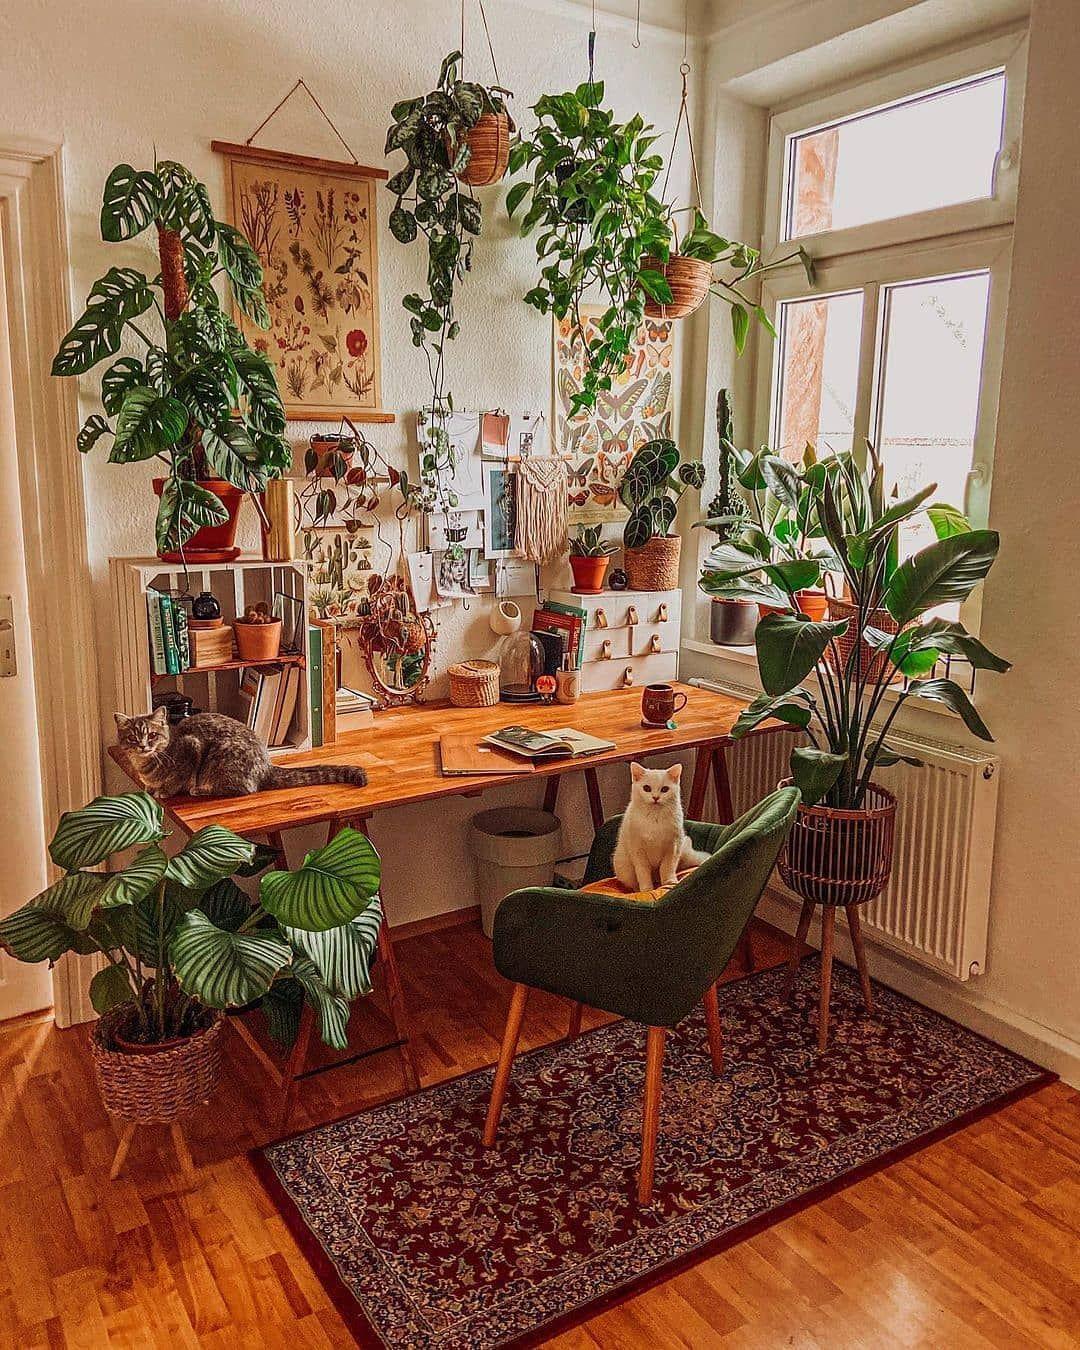 12 Inspiring Small Home Office Decor Ideas